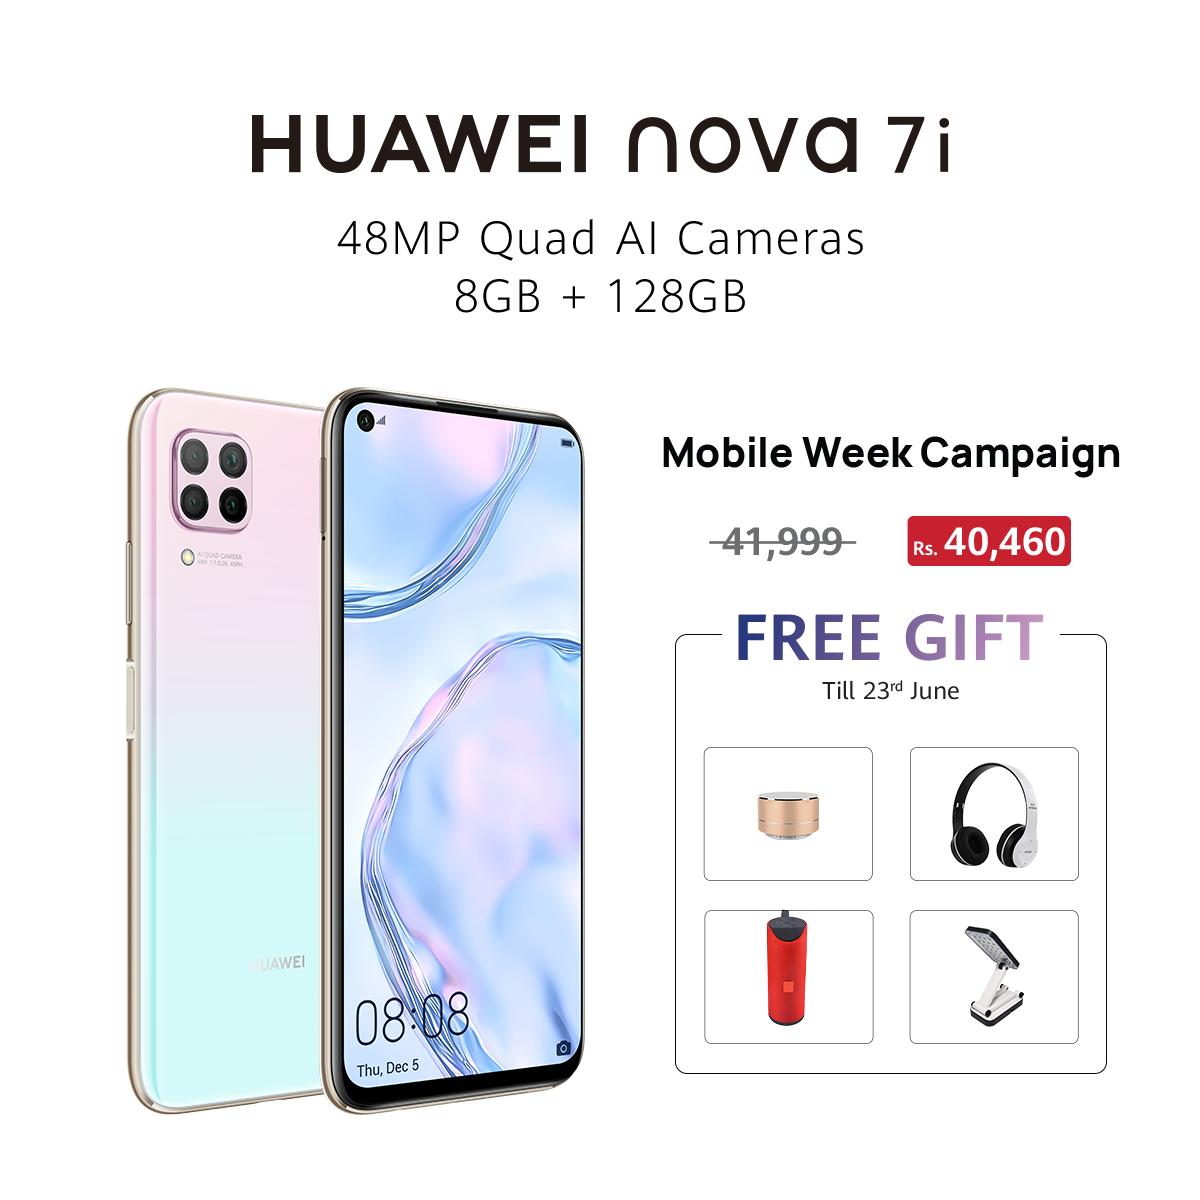 Huawei Nova 7i (4 Free Gifts) - 6.4 Full View Display - 8gb Ram - 128gb Rom - Fingerprint Sensor